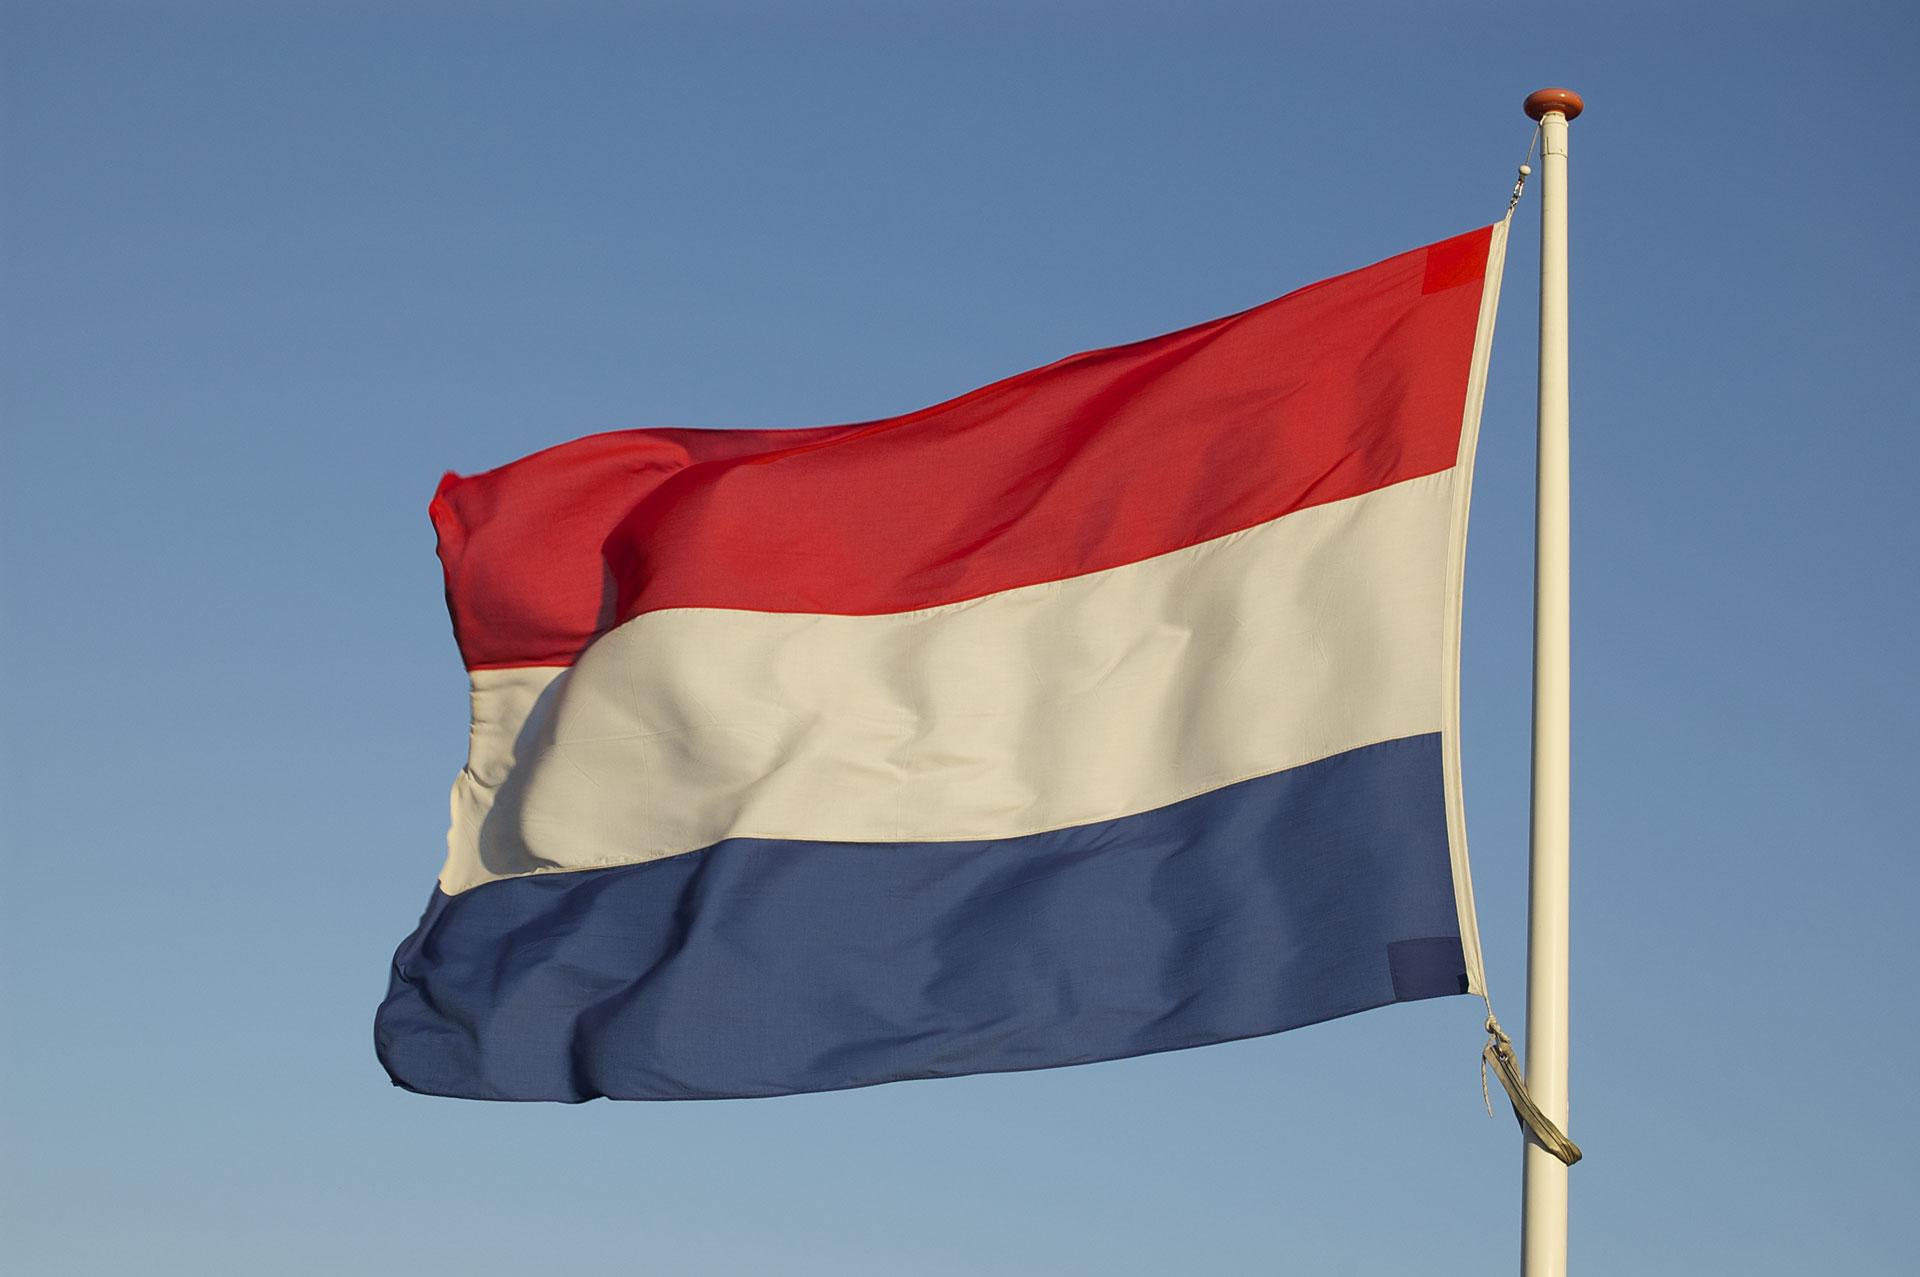 Dutch flag 001 1920x1080